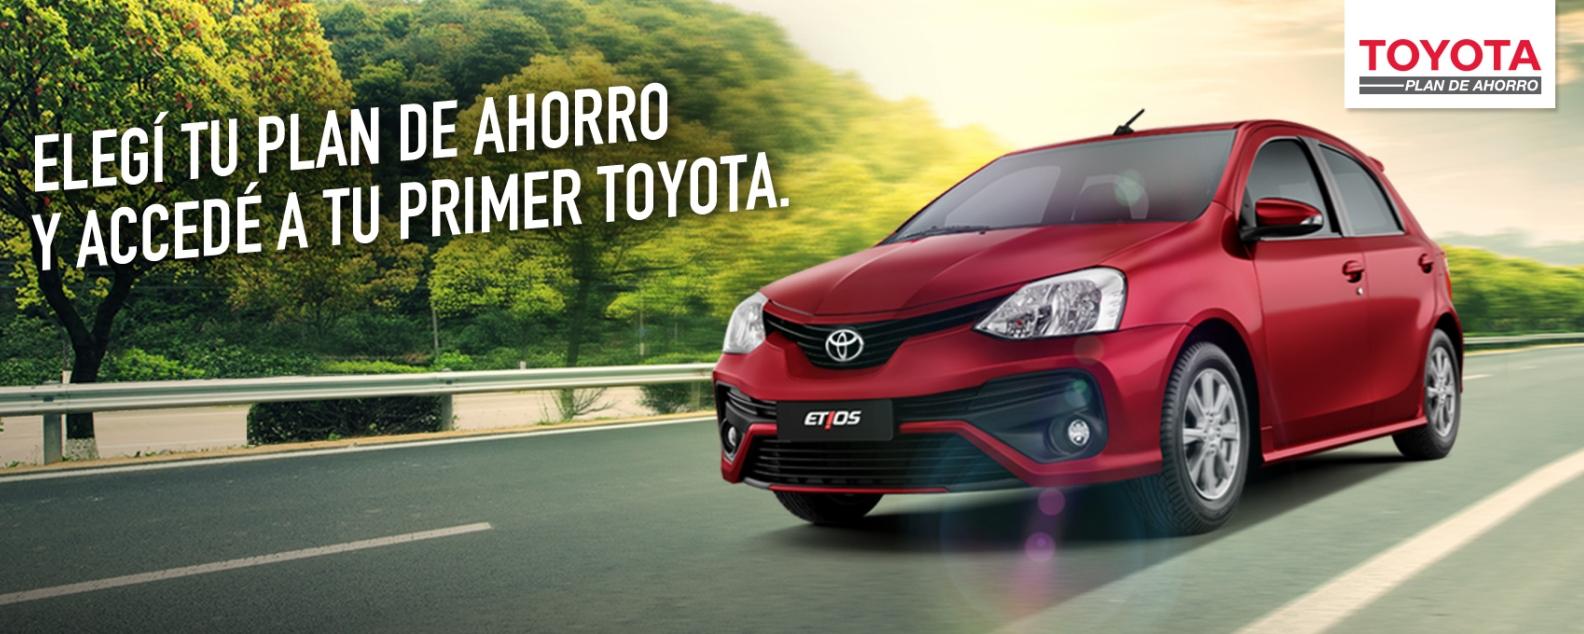 Toyota Etios 2017 Plan de Ahorro